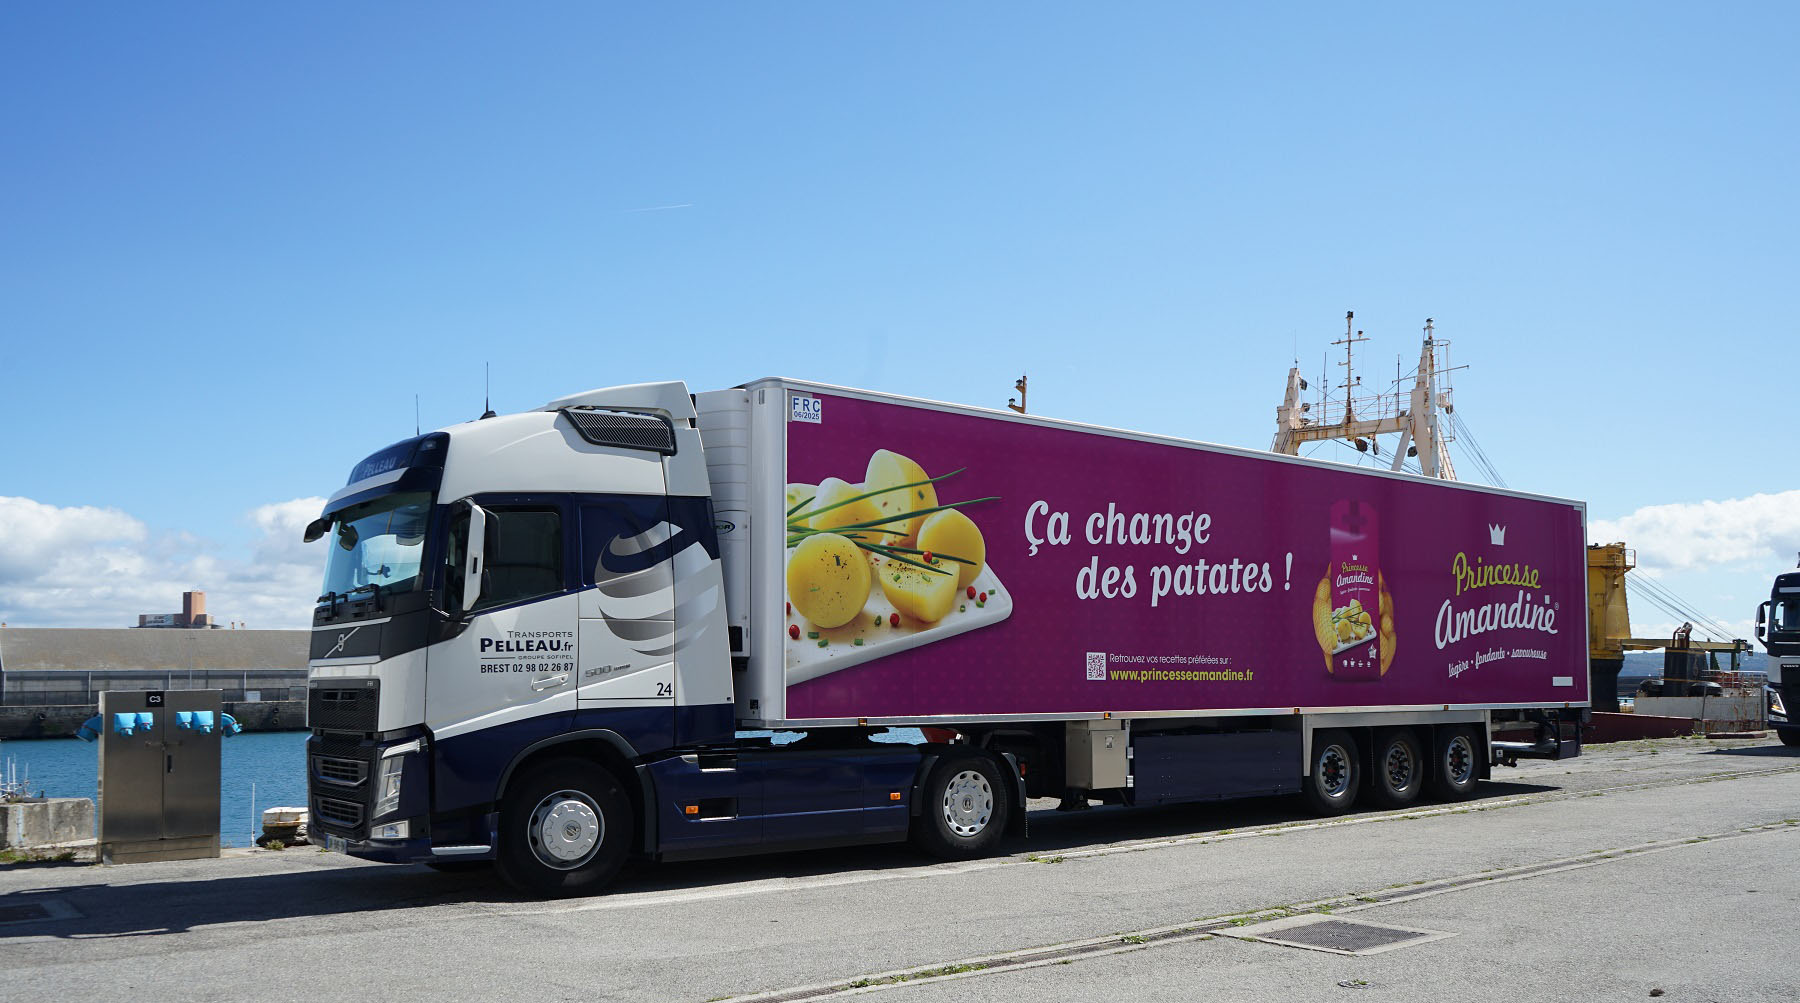 Camion Princesse Amandine